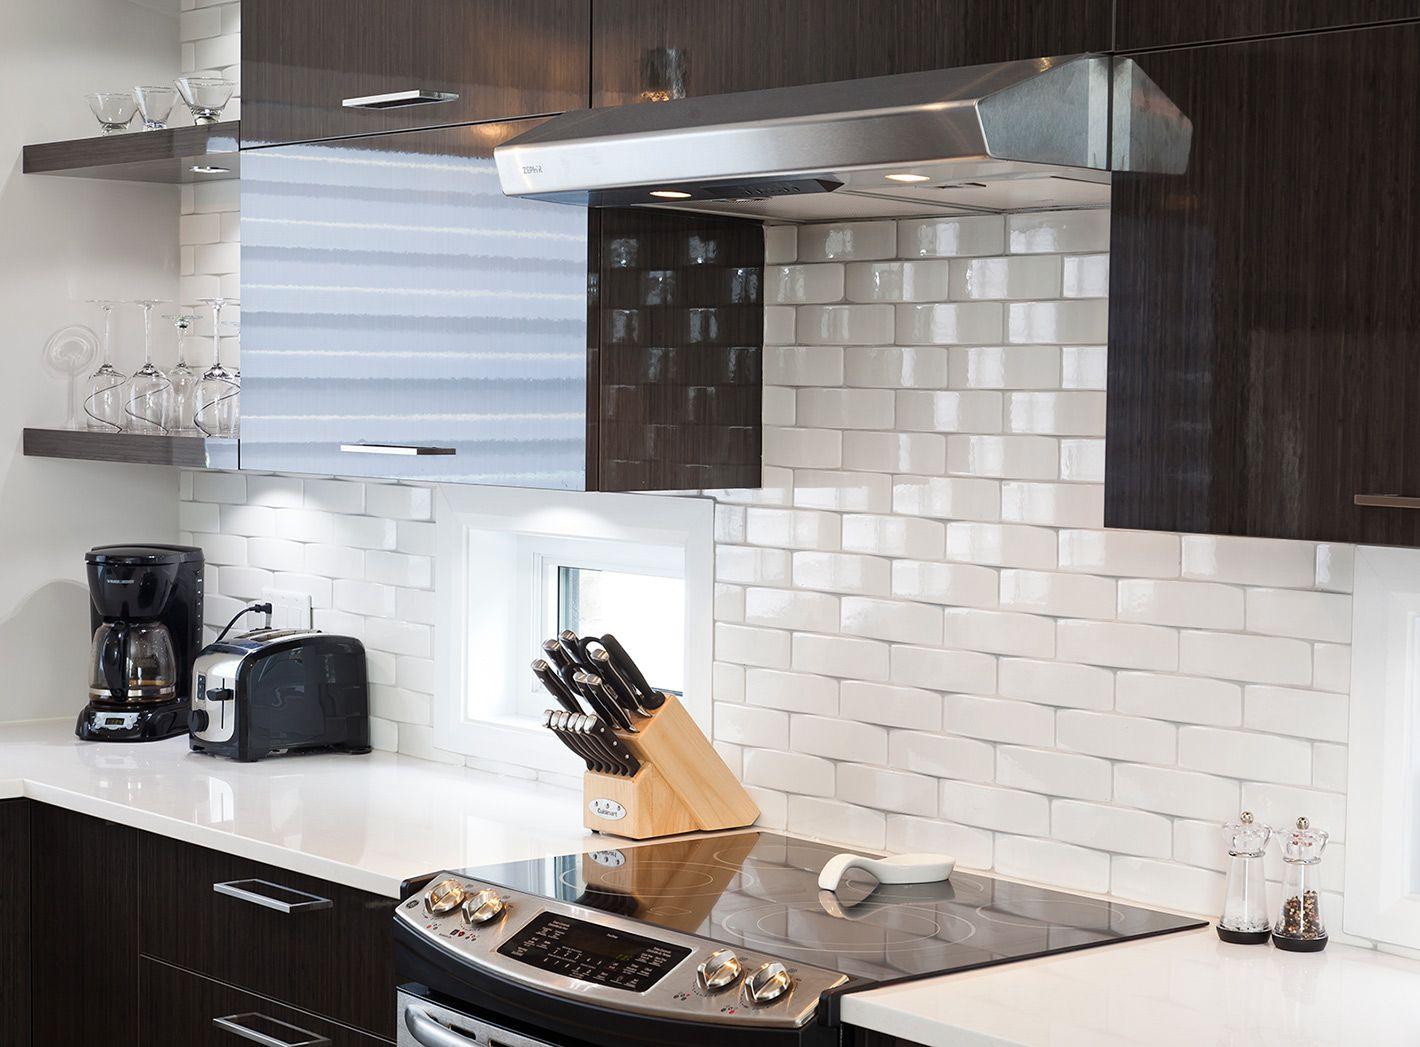 cuisines modernes archives griffe cuisine. Black Bedroom Furniture Sets. Home Design Ideas